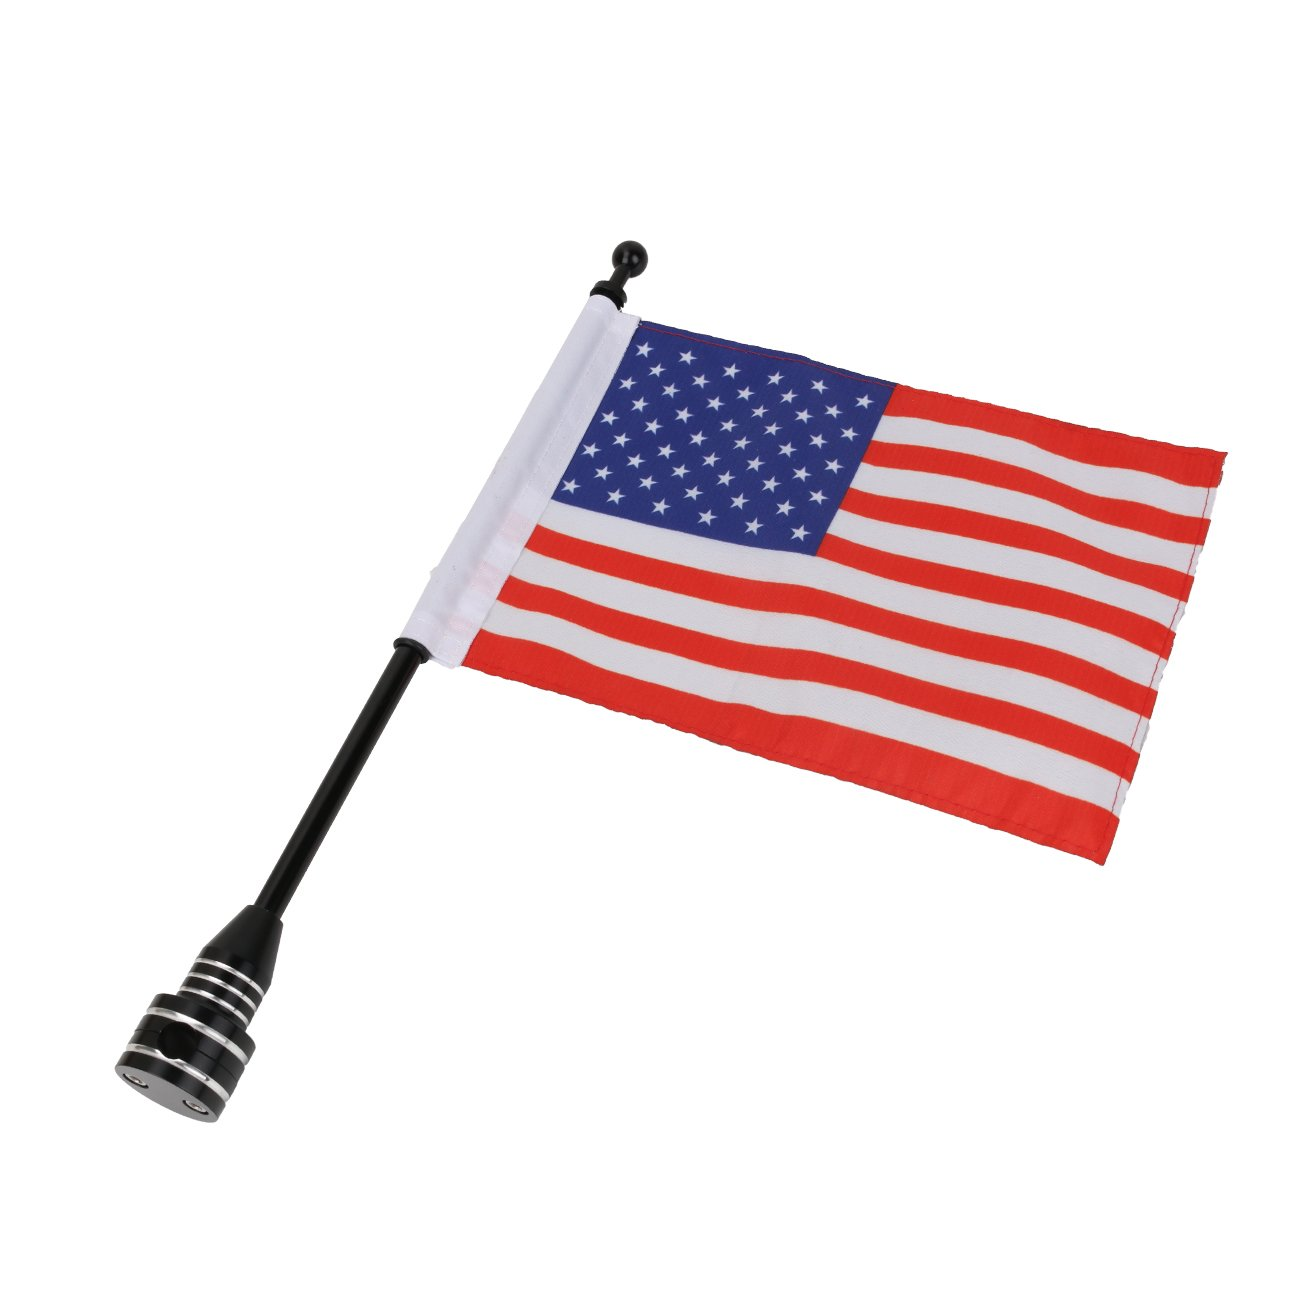 Black Kitty Party For Honda Harley Kawasaki Suzuki Yamaha Luggage Rack Rear Side Mount Flag Pole with American USA Flag